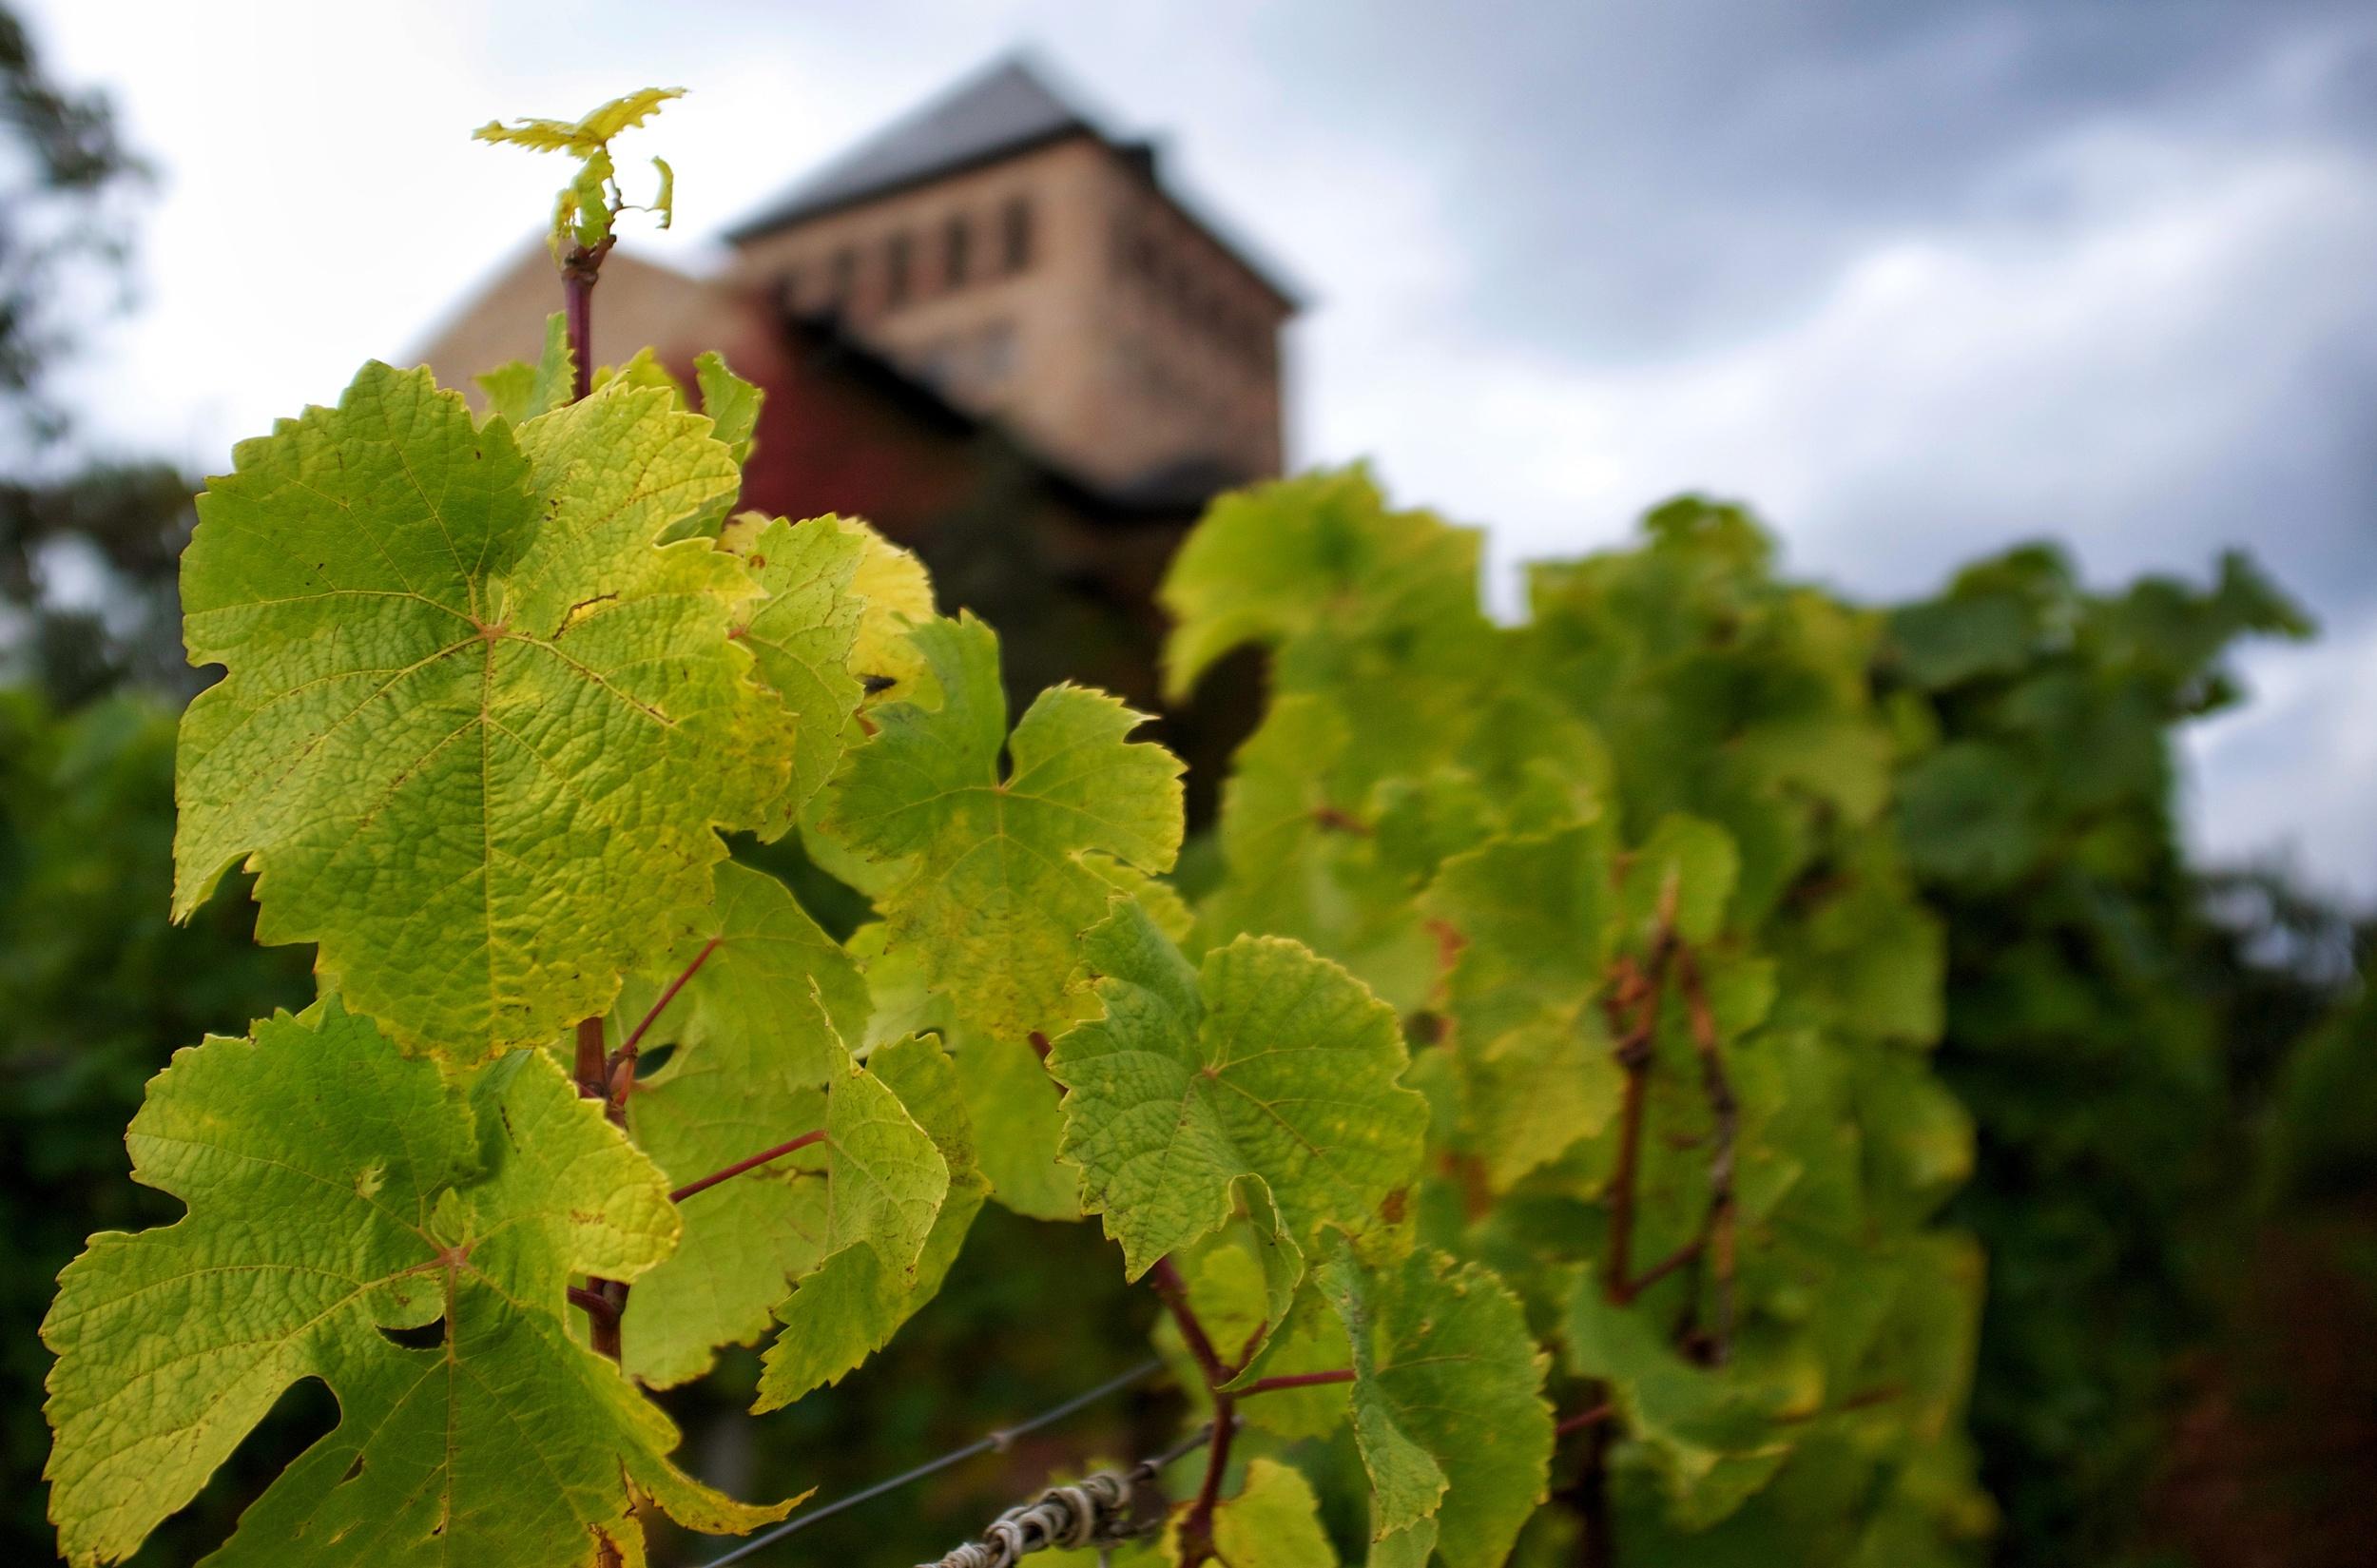 The Basilika and vines